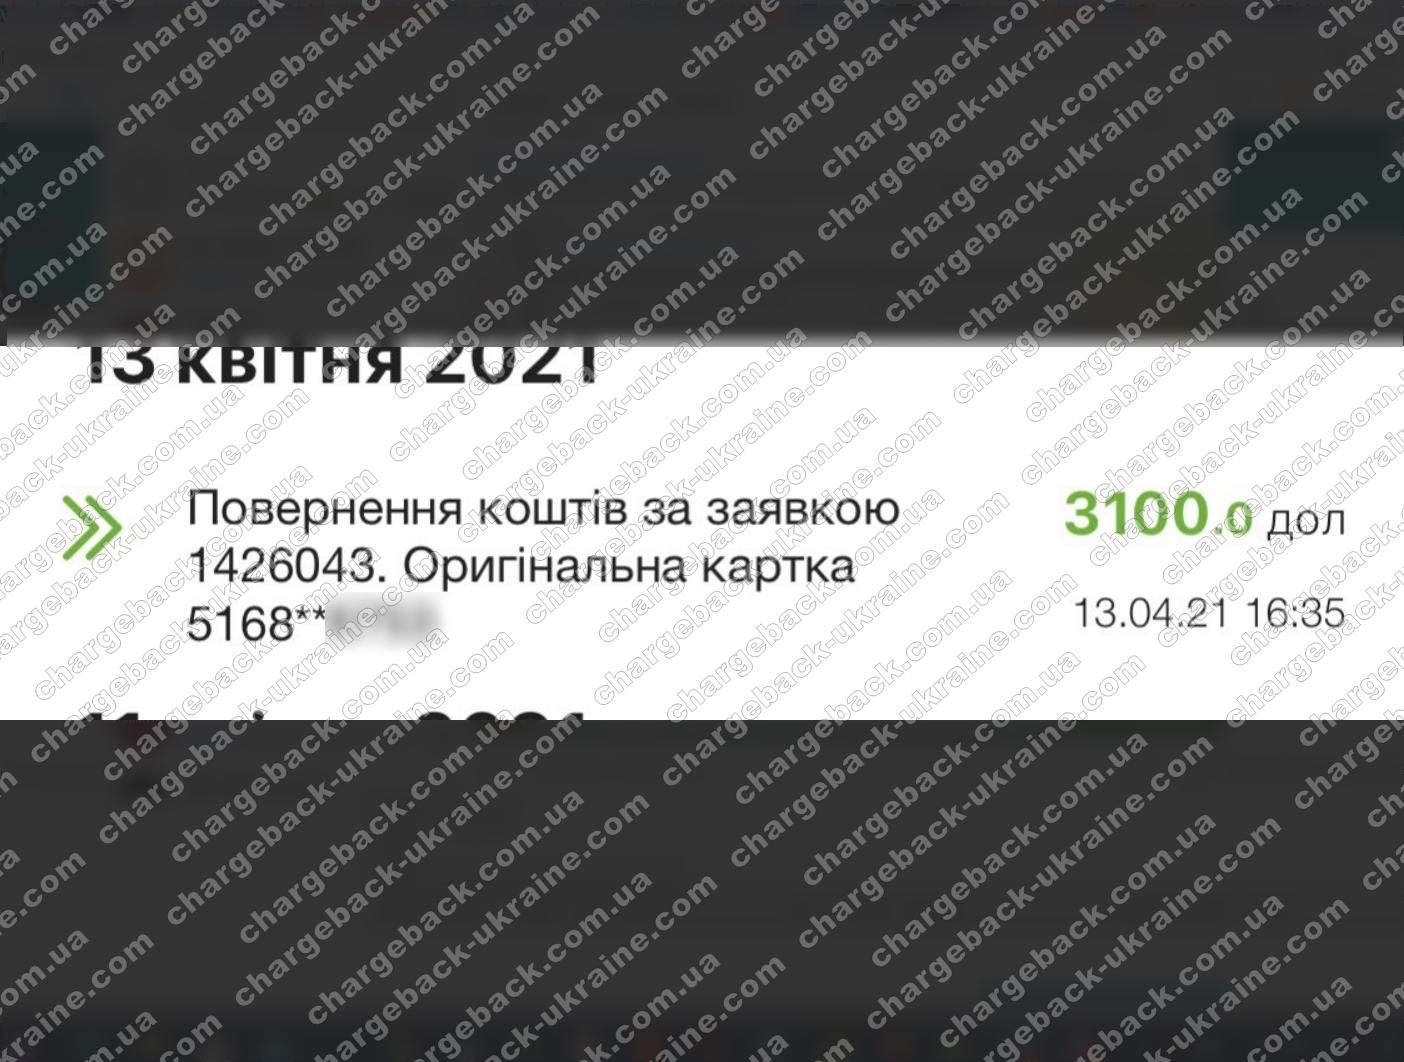 13.04.2021 возврат из TradersHome 3100 USD